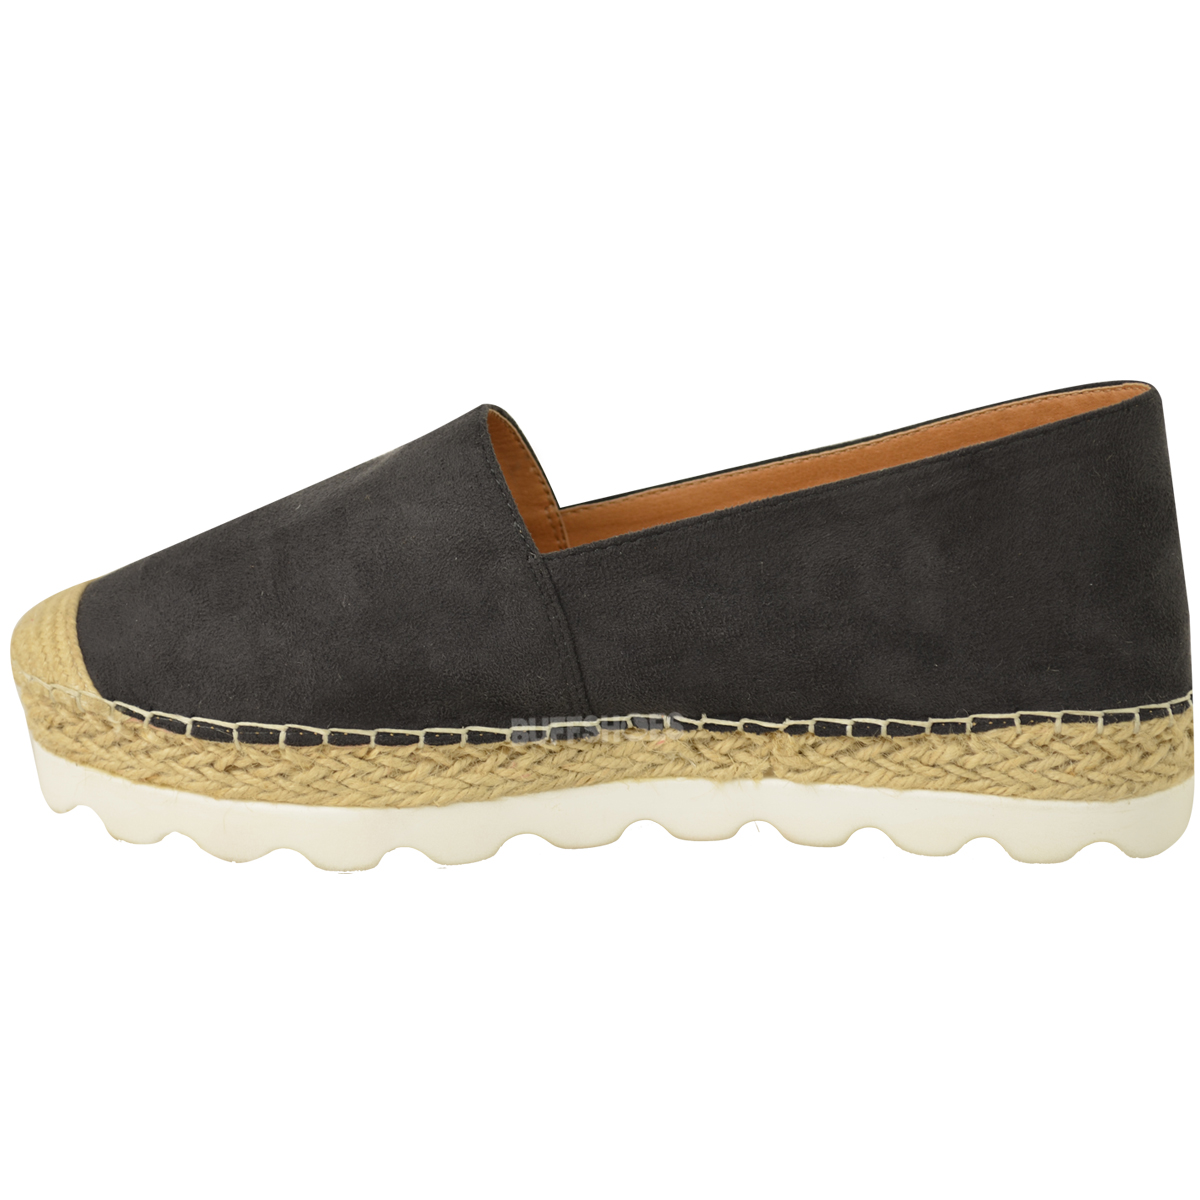 Womens Deck Shoes Amazon